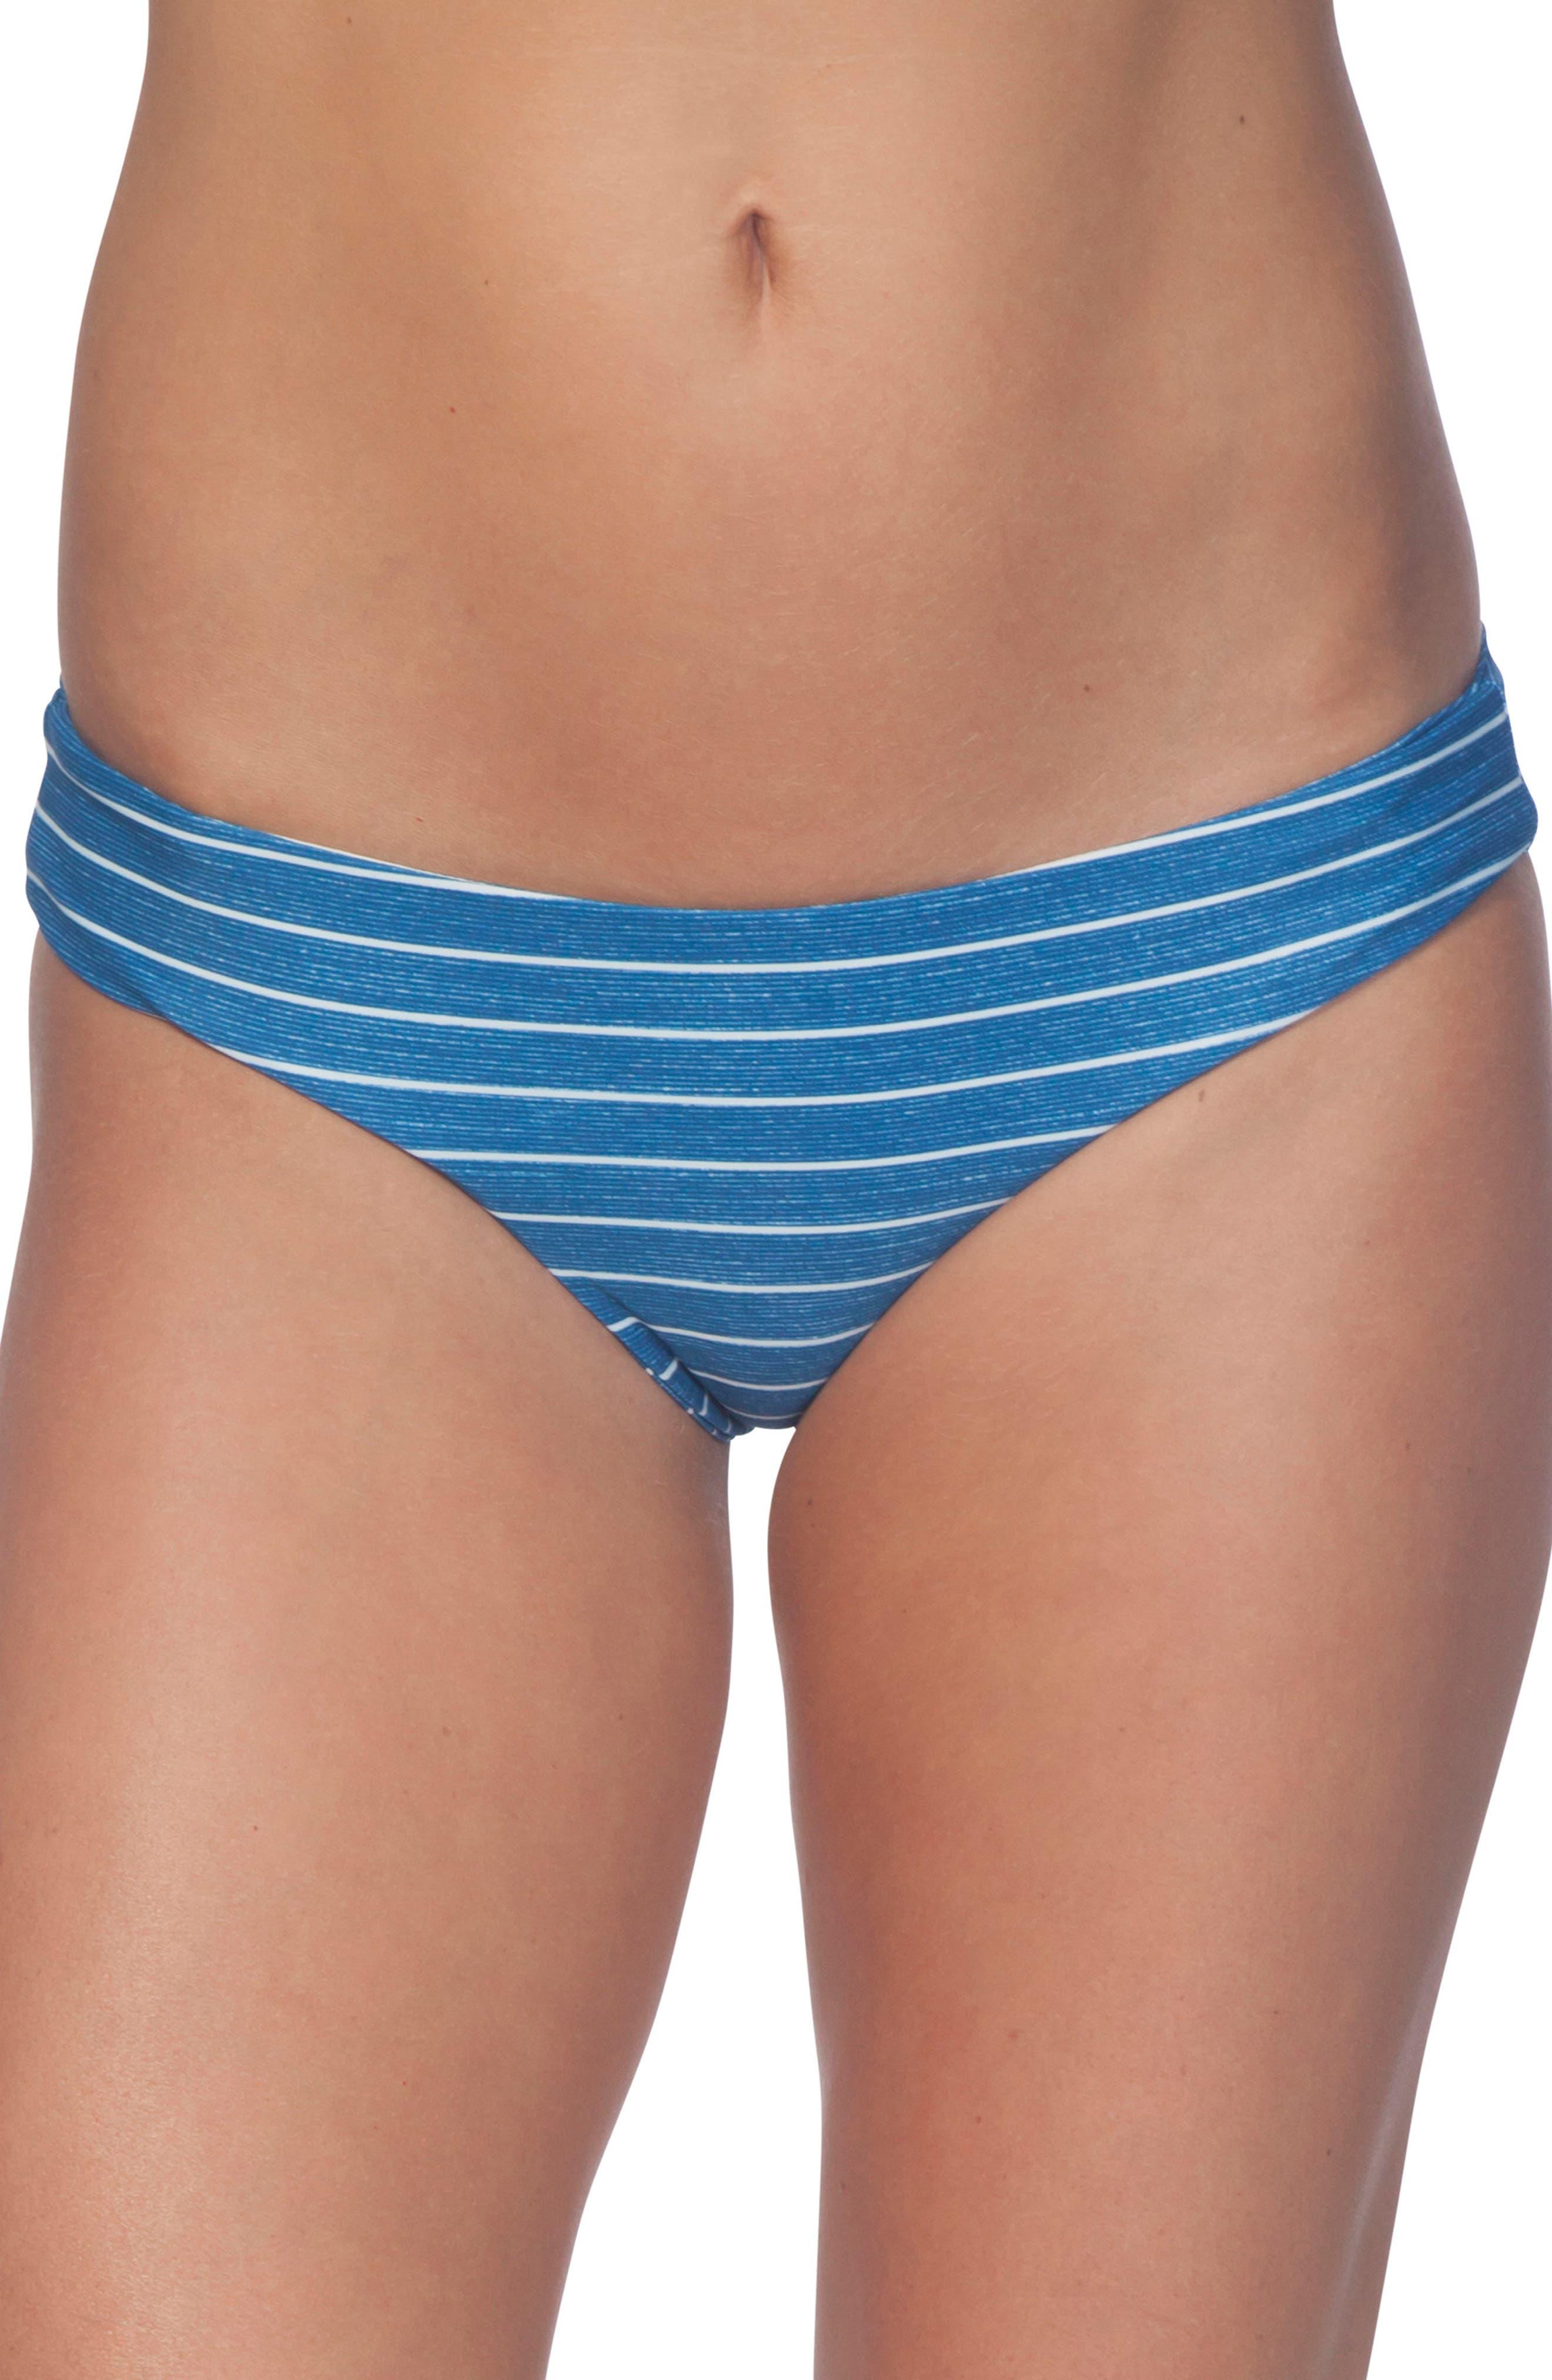 Premium Surf Hipster Bikini Bottoms,                             Main thumbnail 1, color,                             NAVY